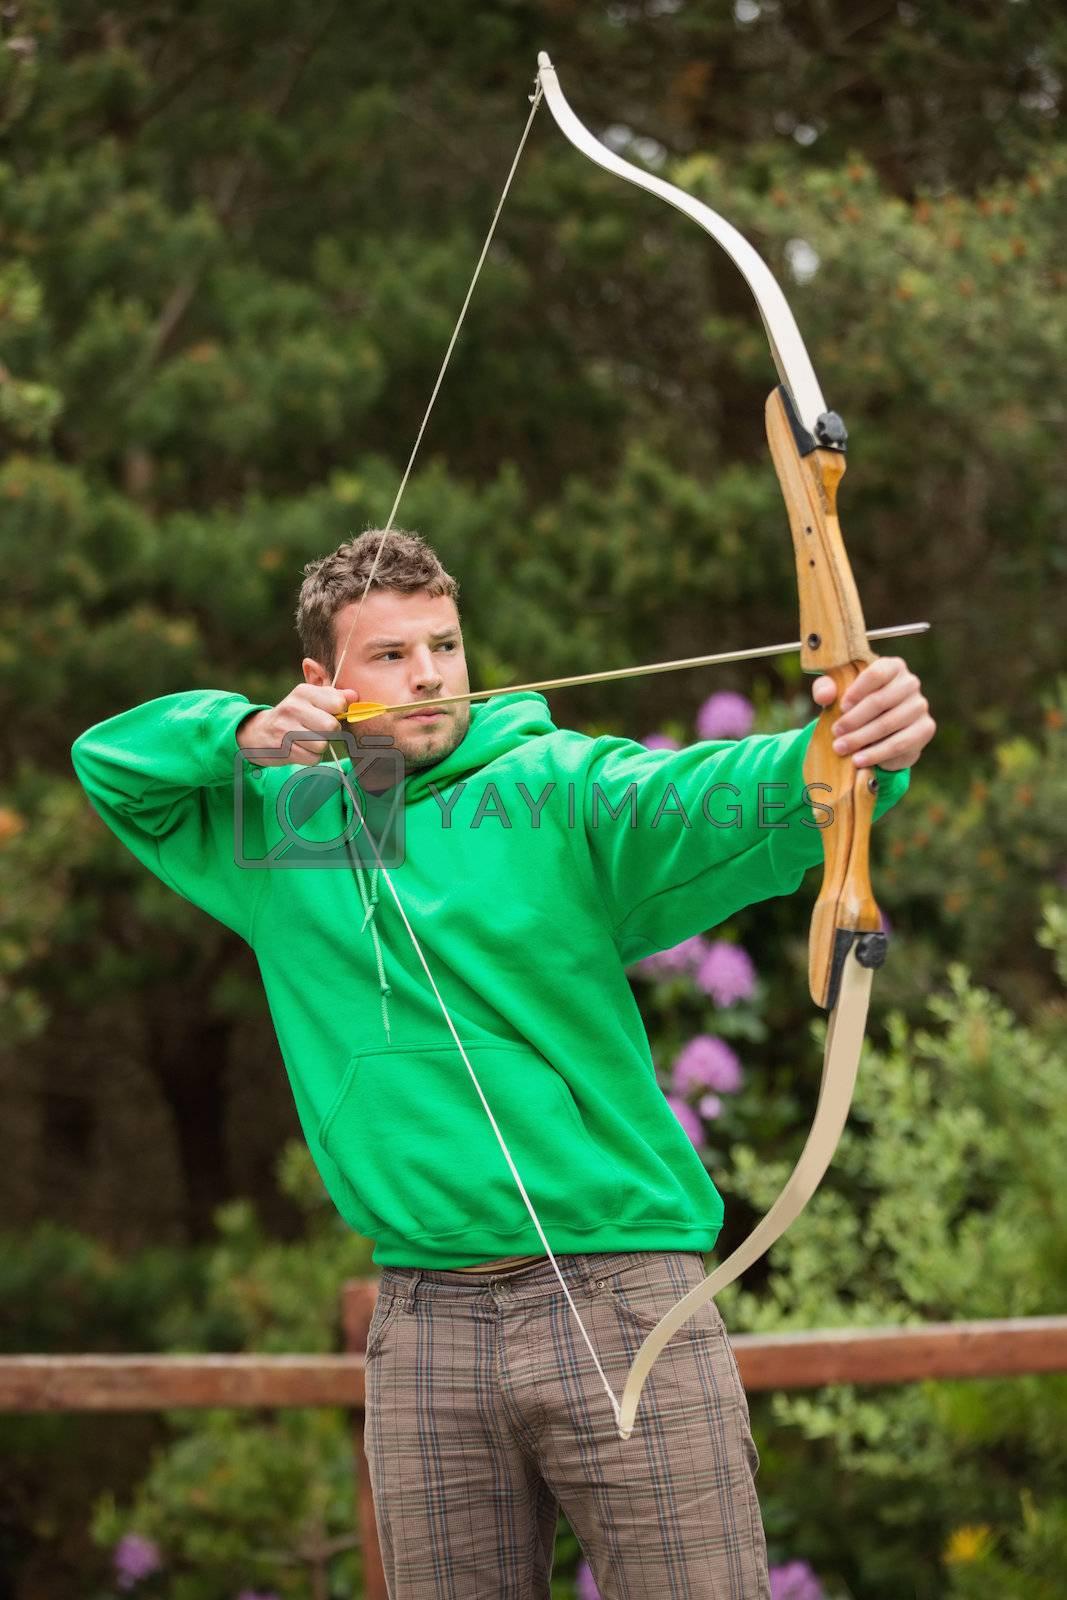 Focused man practicing archery by Wavebreakmedia